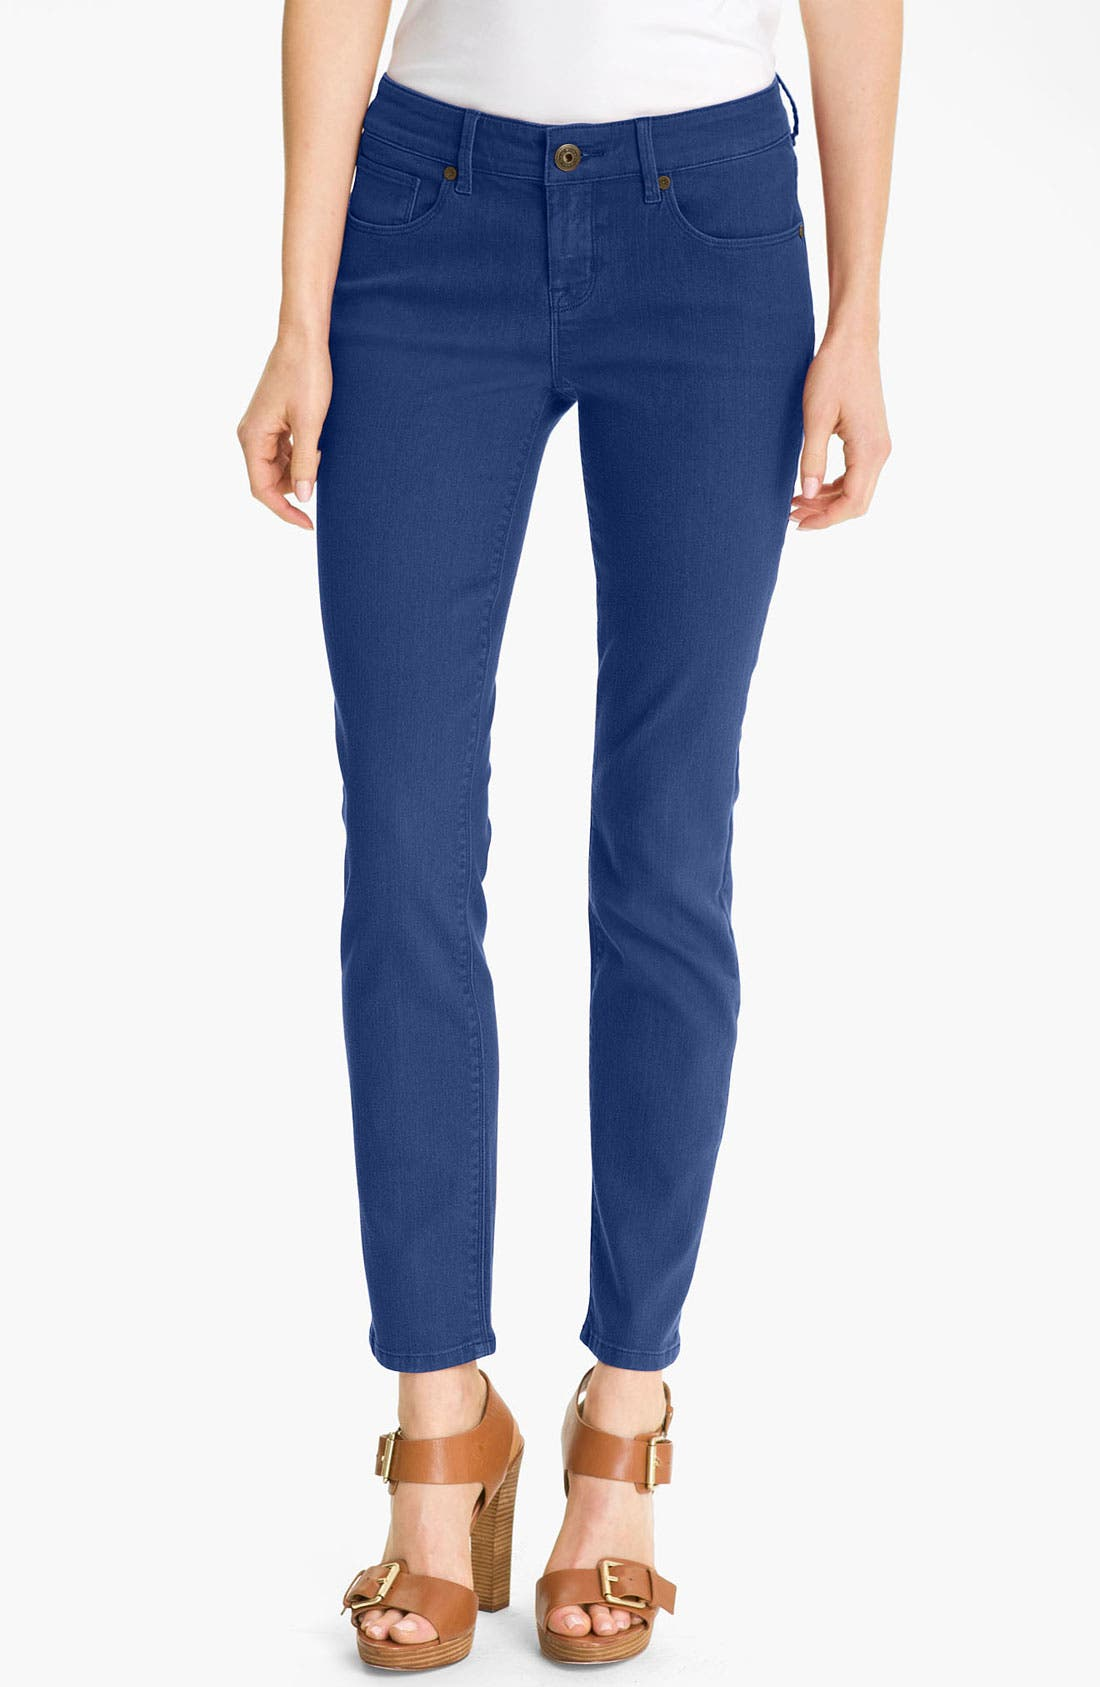 Main Image - Isaac Mizrahi Jeans 'Samantha' Colored Denim Skinny Jeans